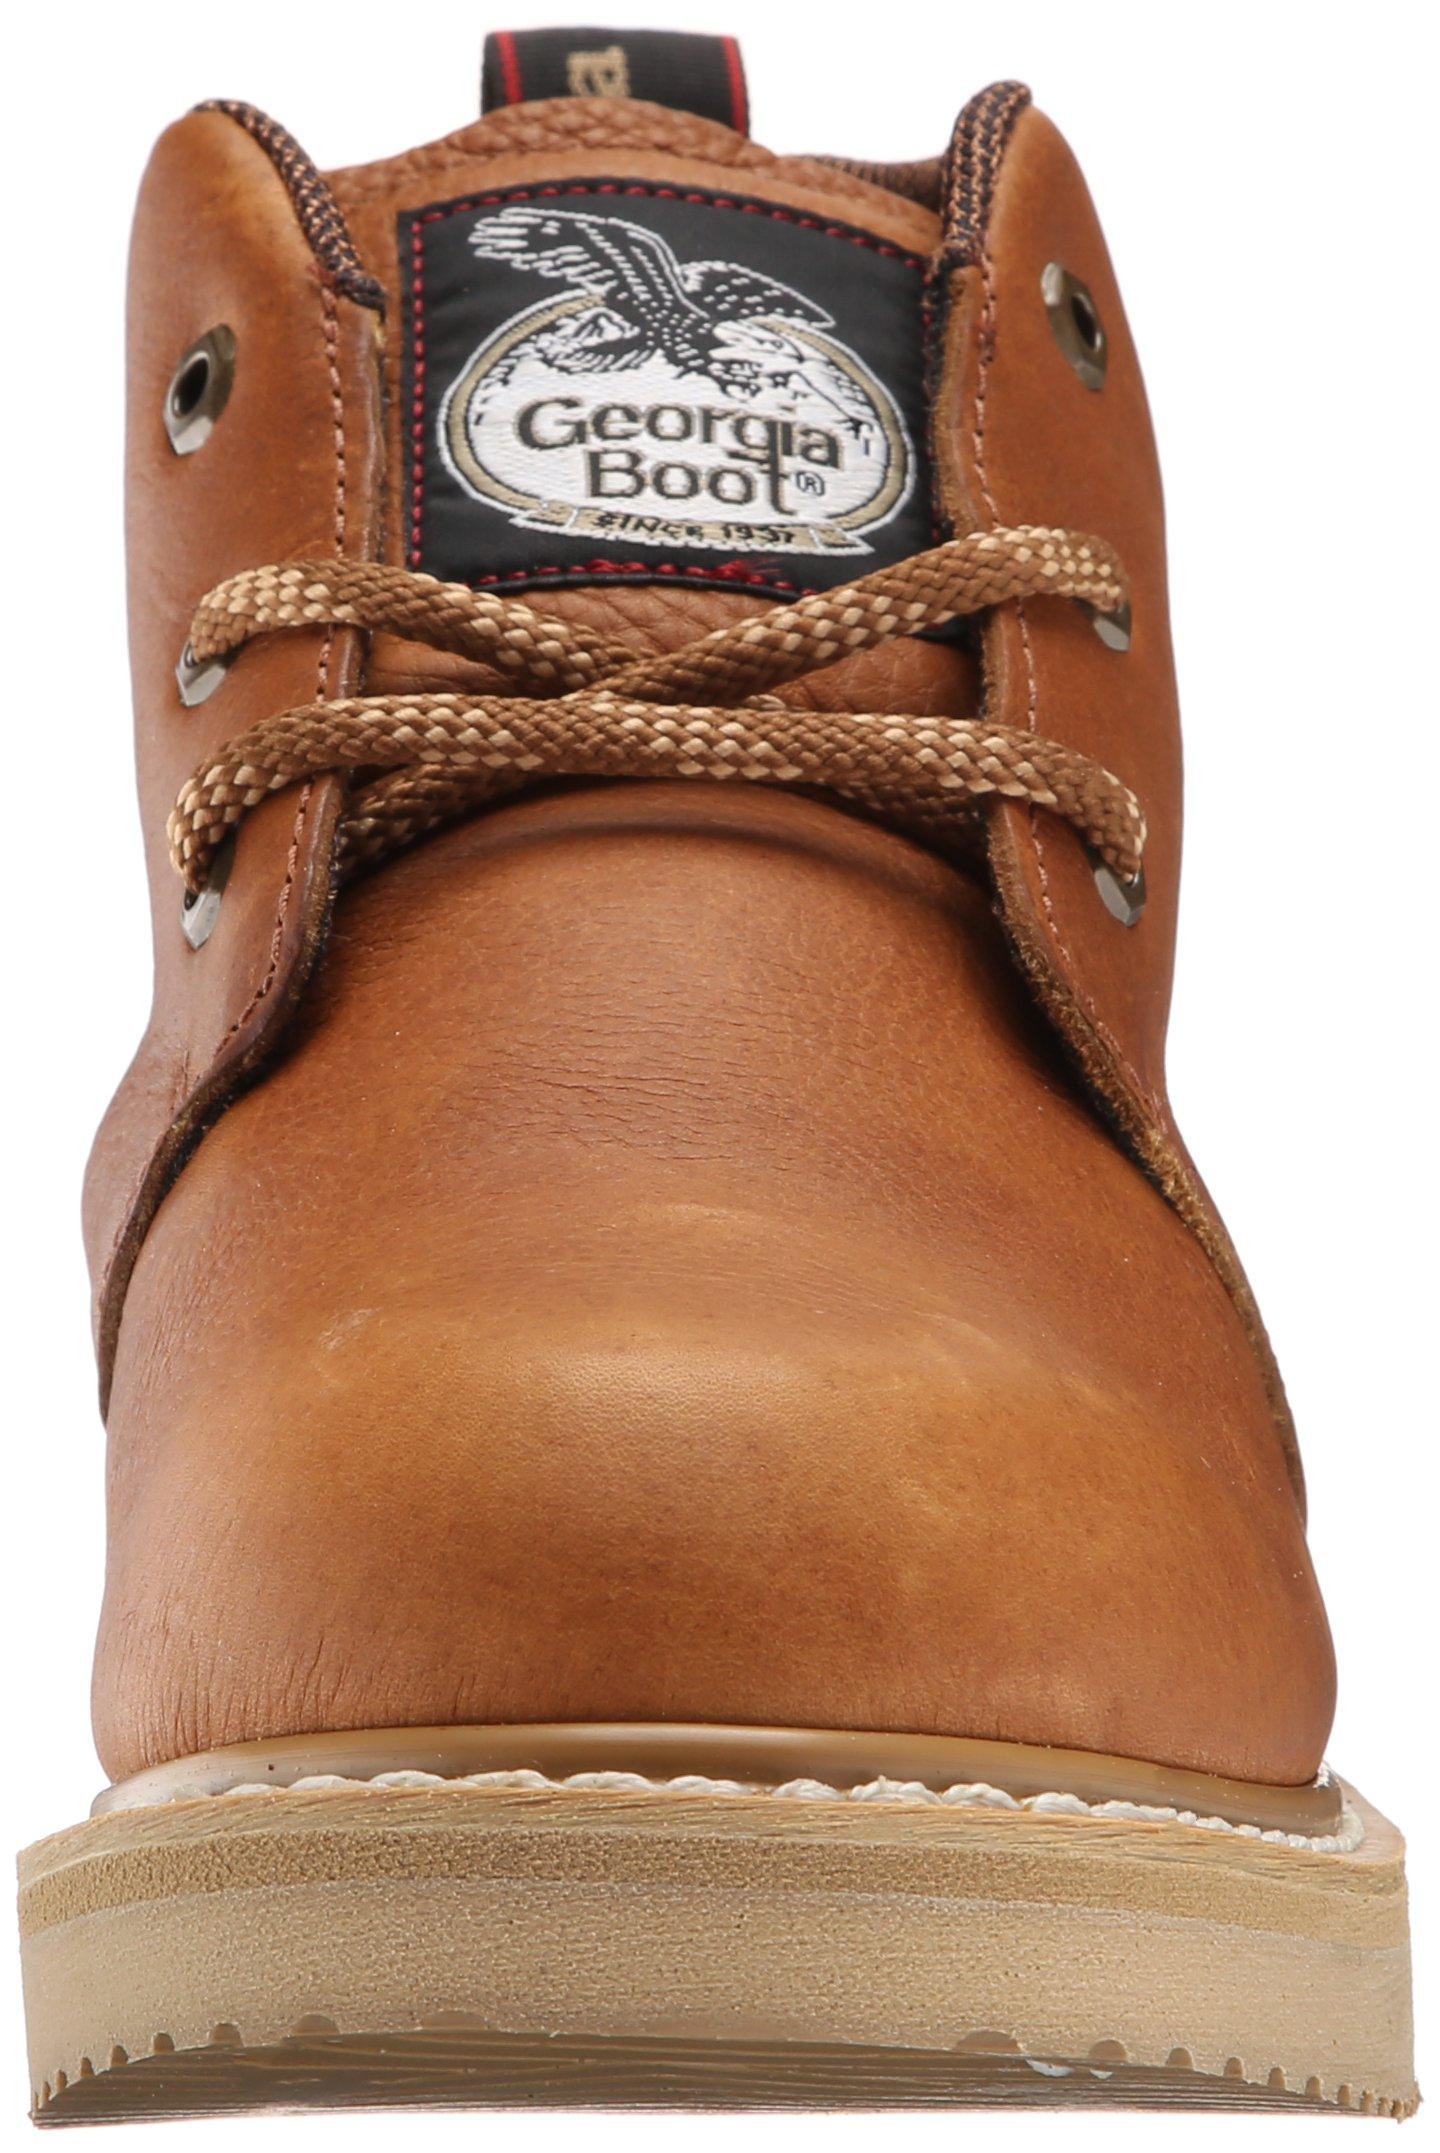 Georgia Boot Men's GB1222 Chukka Boot,Barracuda Gold,9.5 W US by Georgia (Image #4)